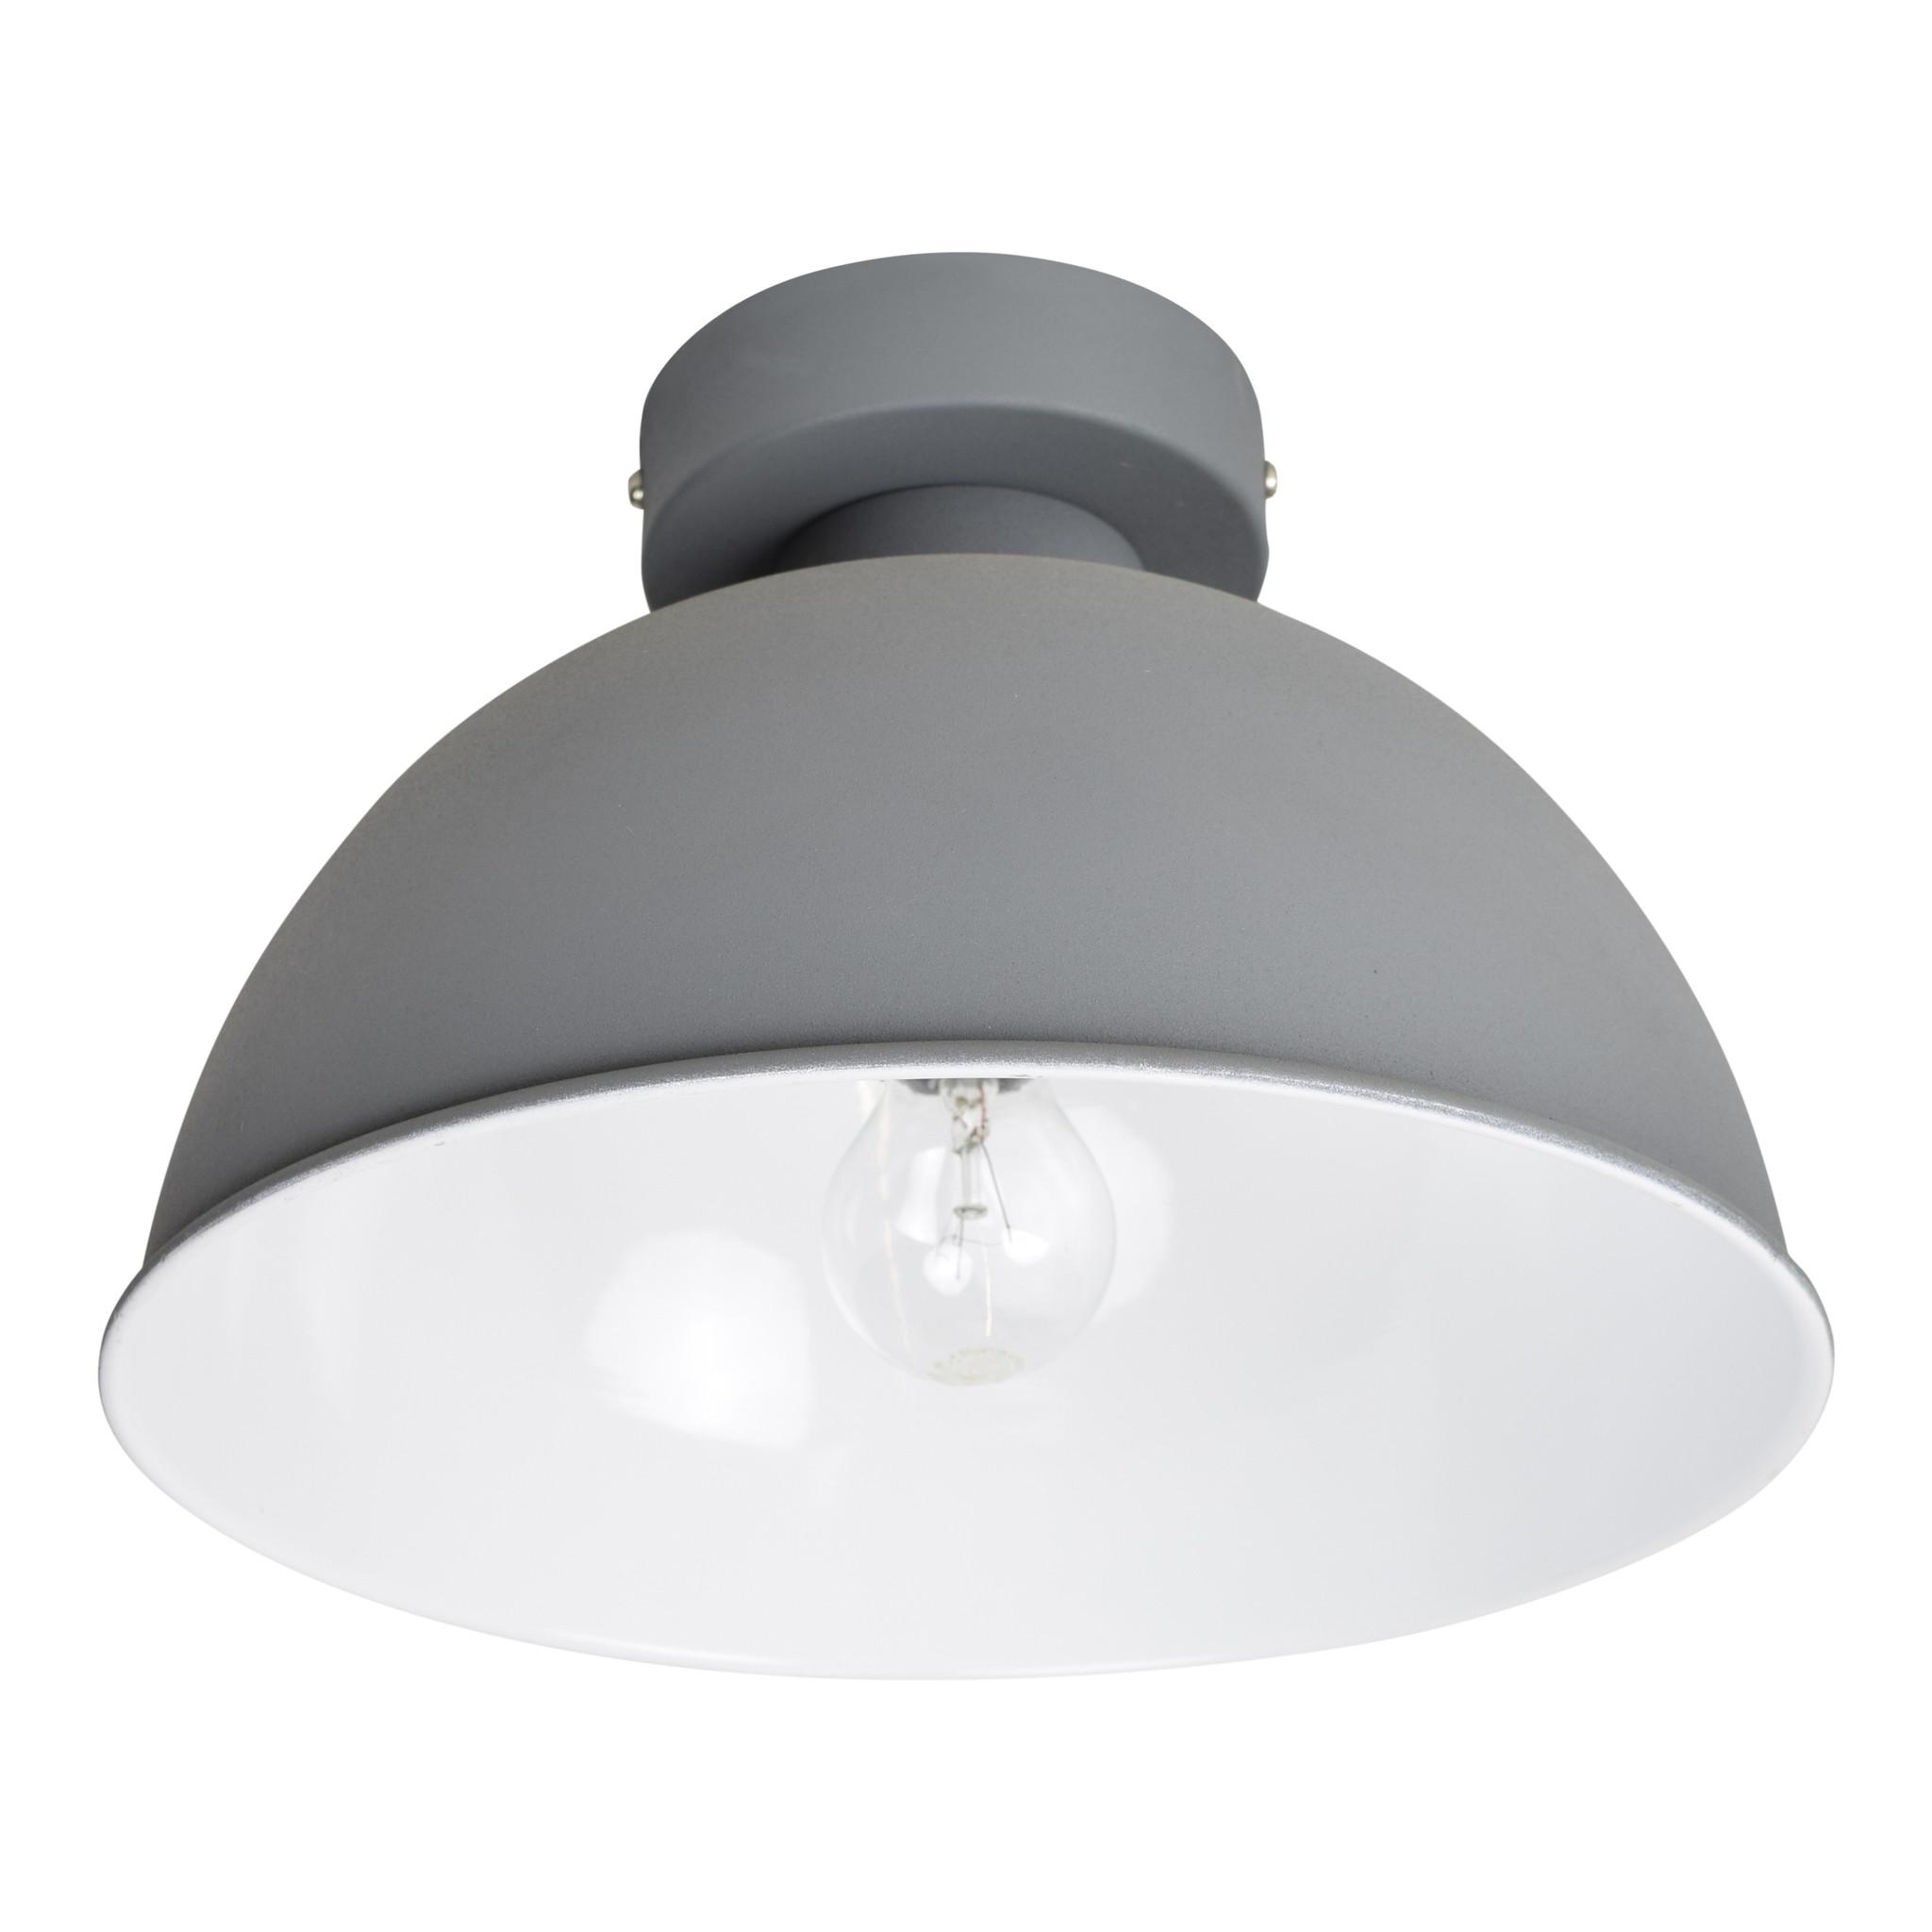 Urban Interiors Urban Interiors Plafondlamp industrial ø30 cm Vintage grey